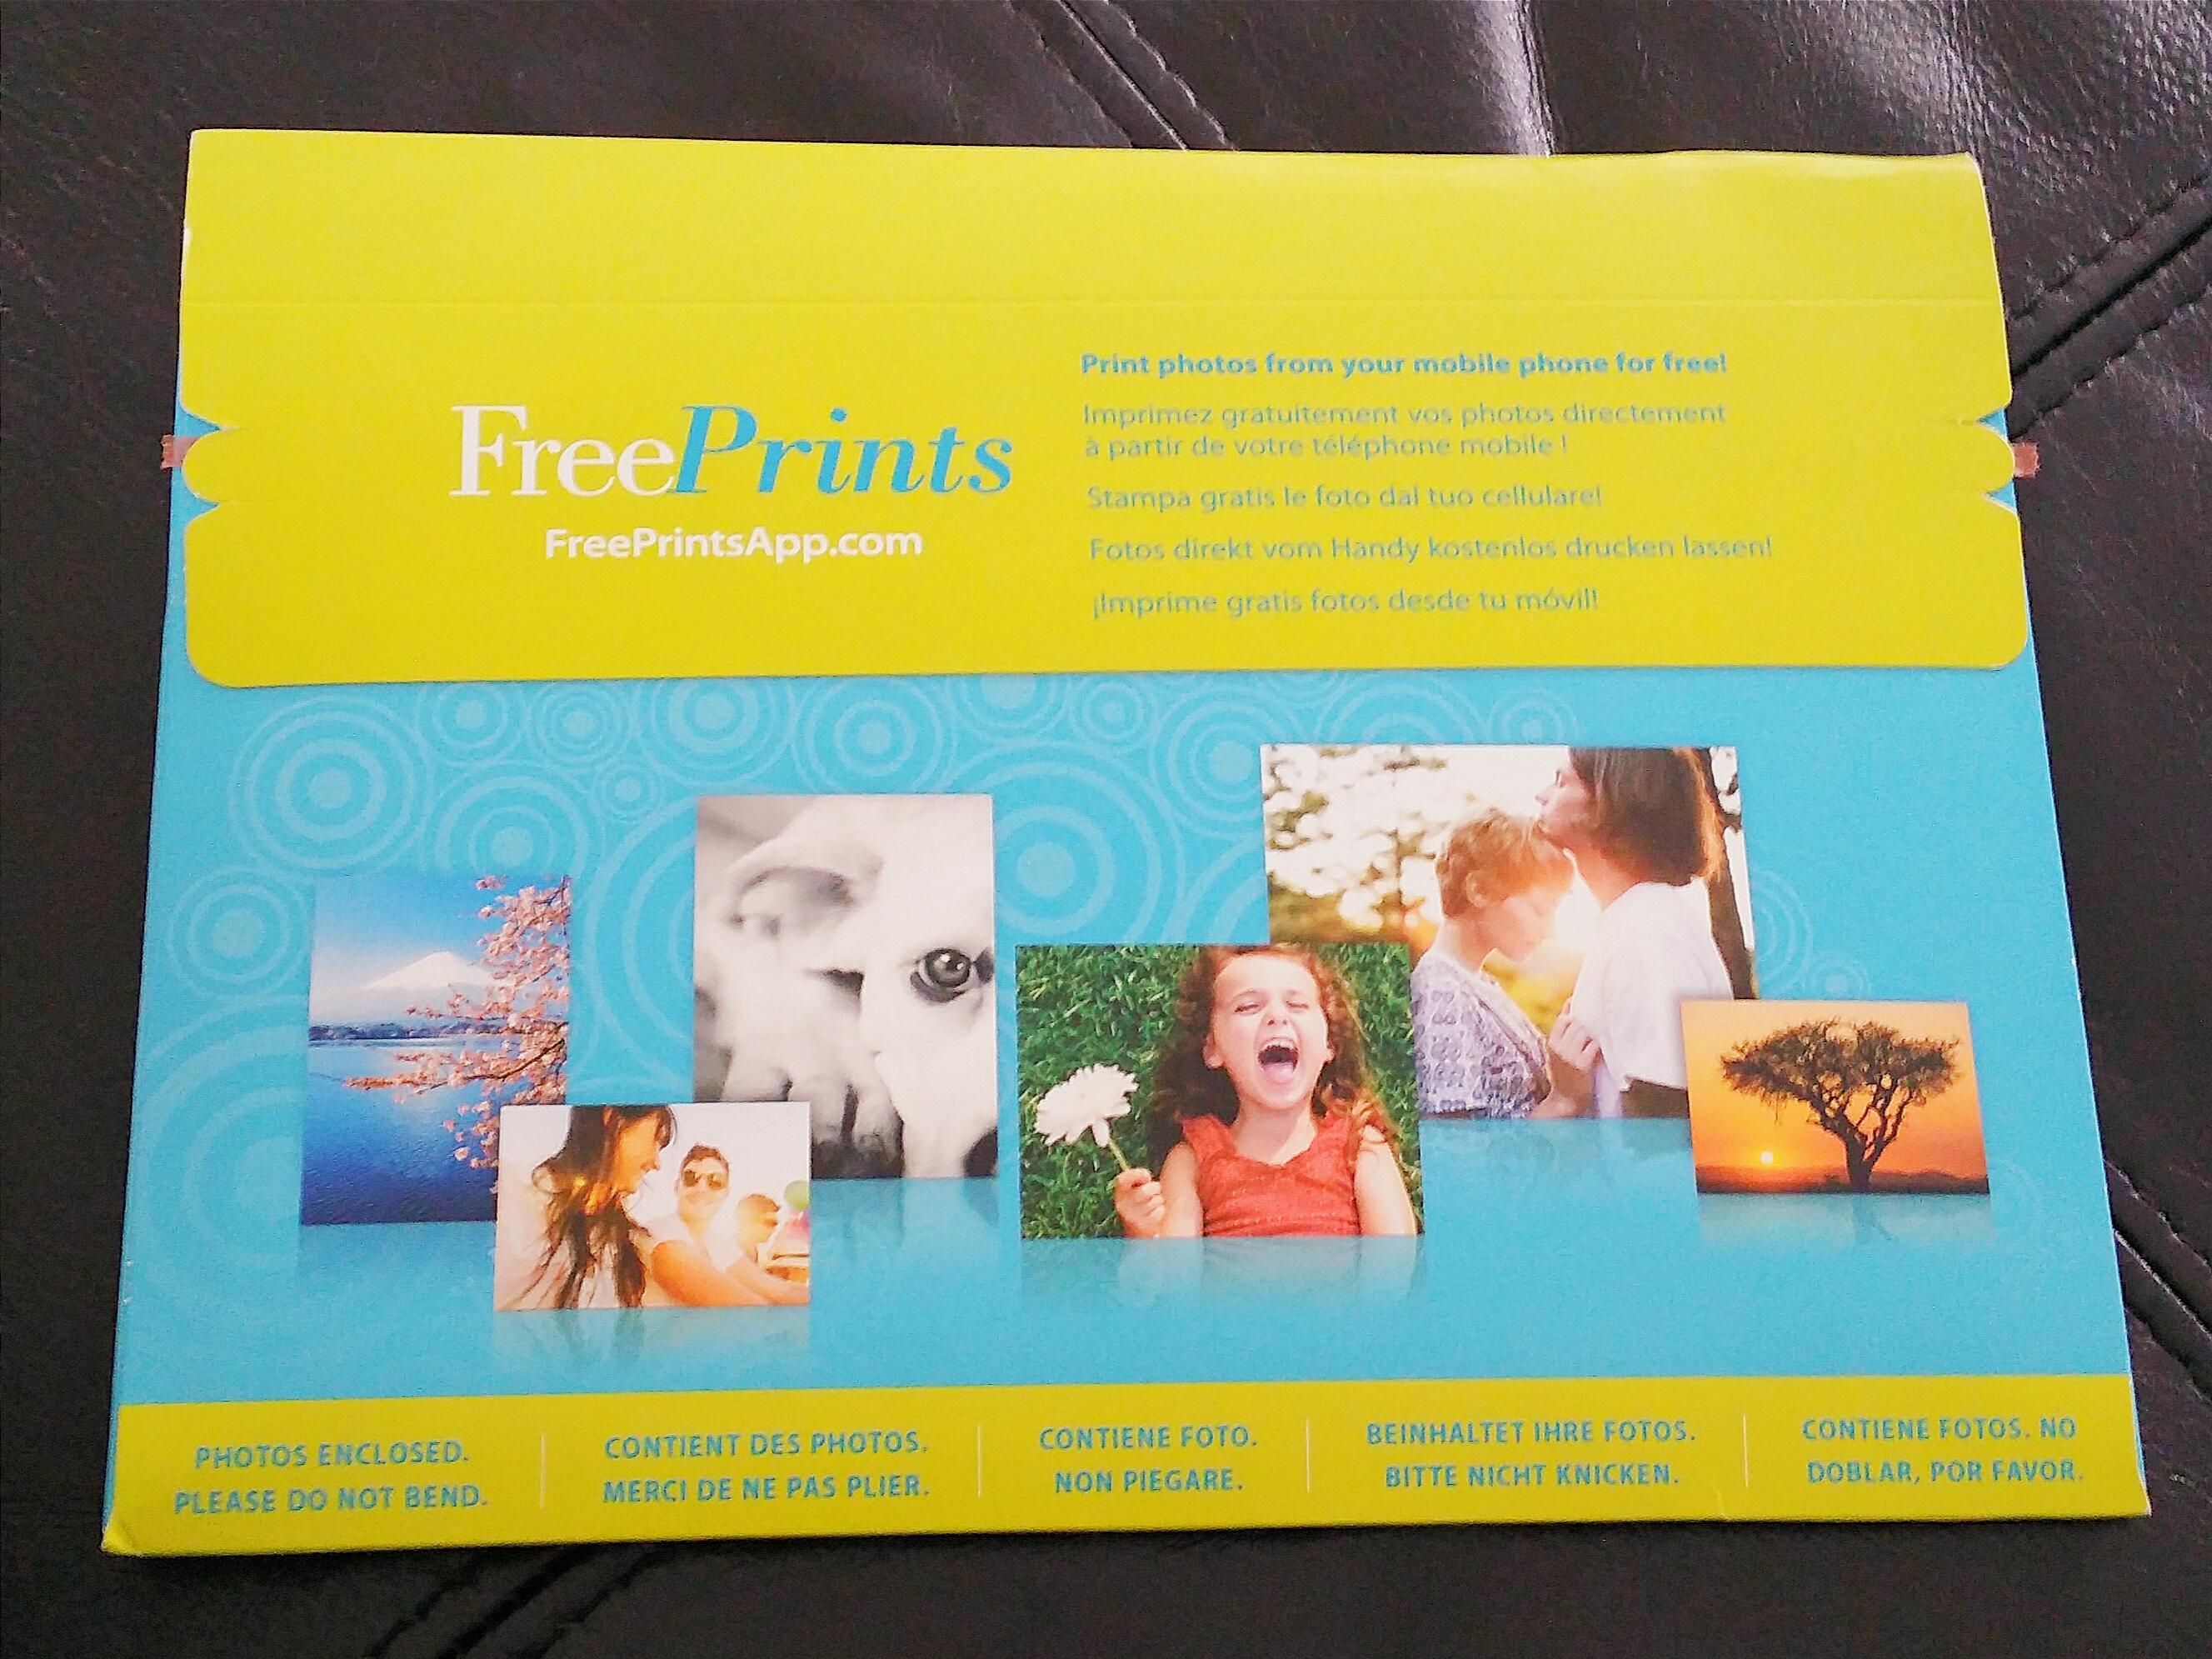 free prints photo printing